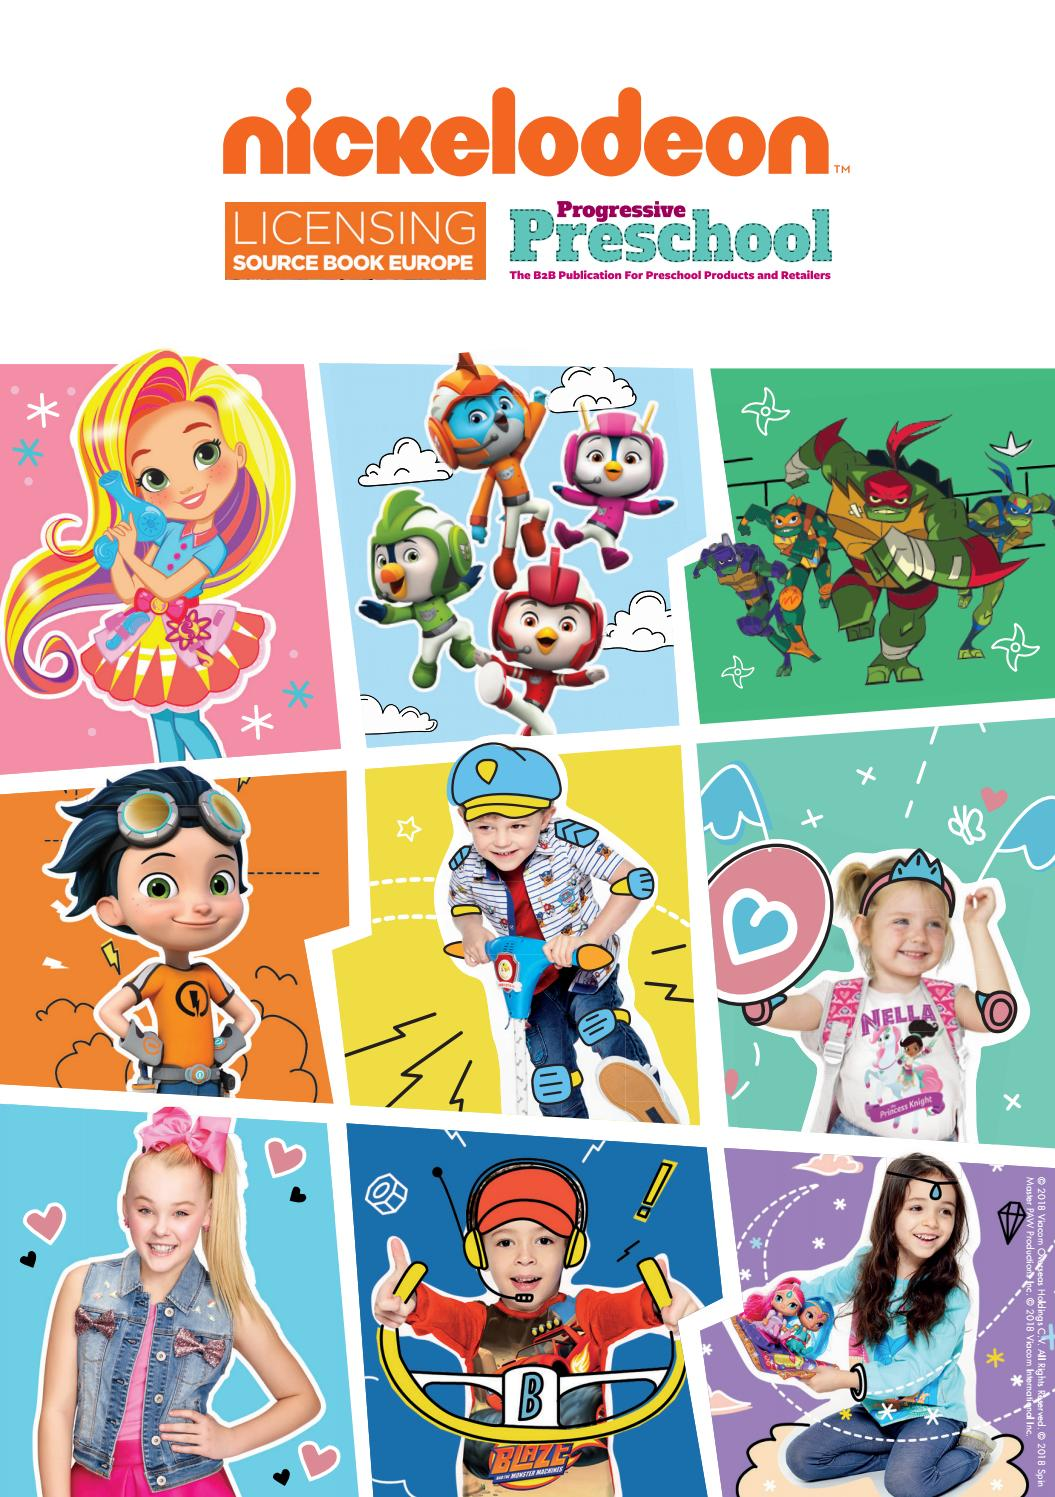 Nickelodeon Viewership Statistics : nickelodeon, viewership, statistics, Nickelodeon, Supplement, Licensing, Source, Book/Progressive, Preschool, Media, Group, Issuu